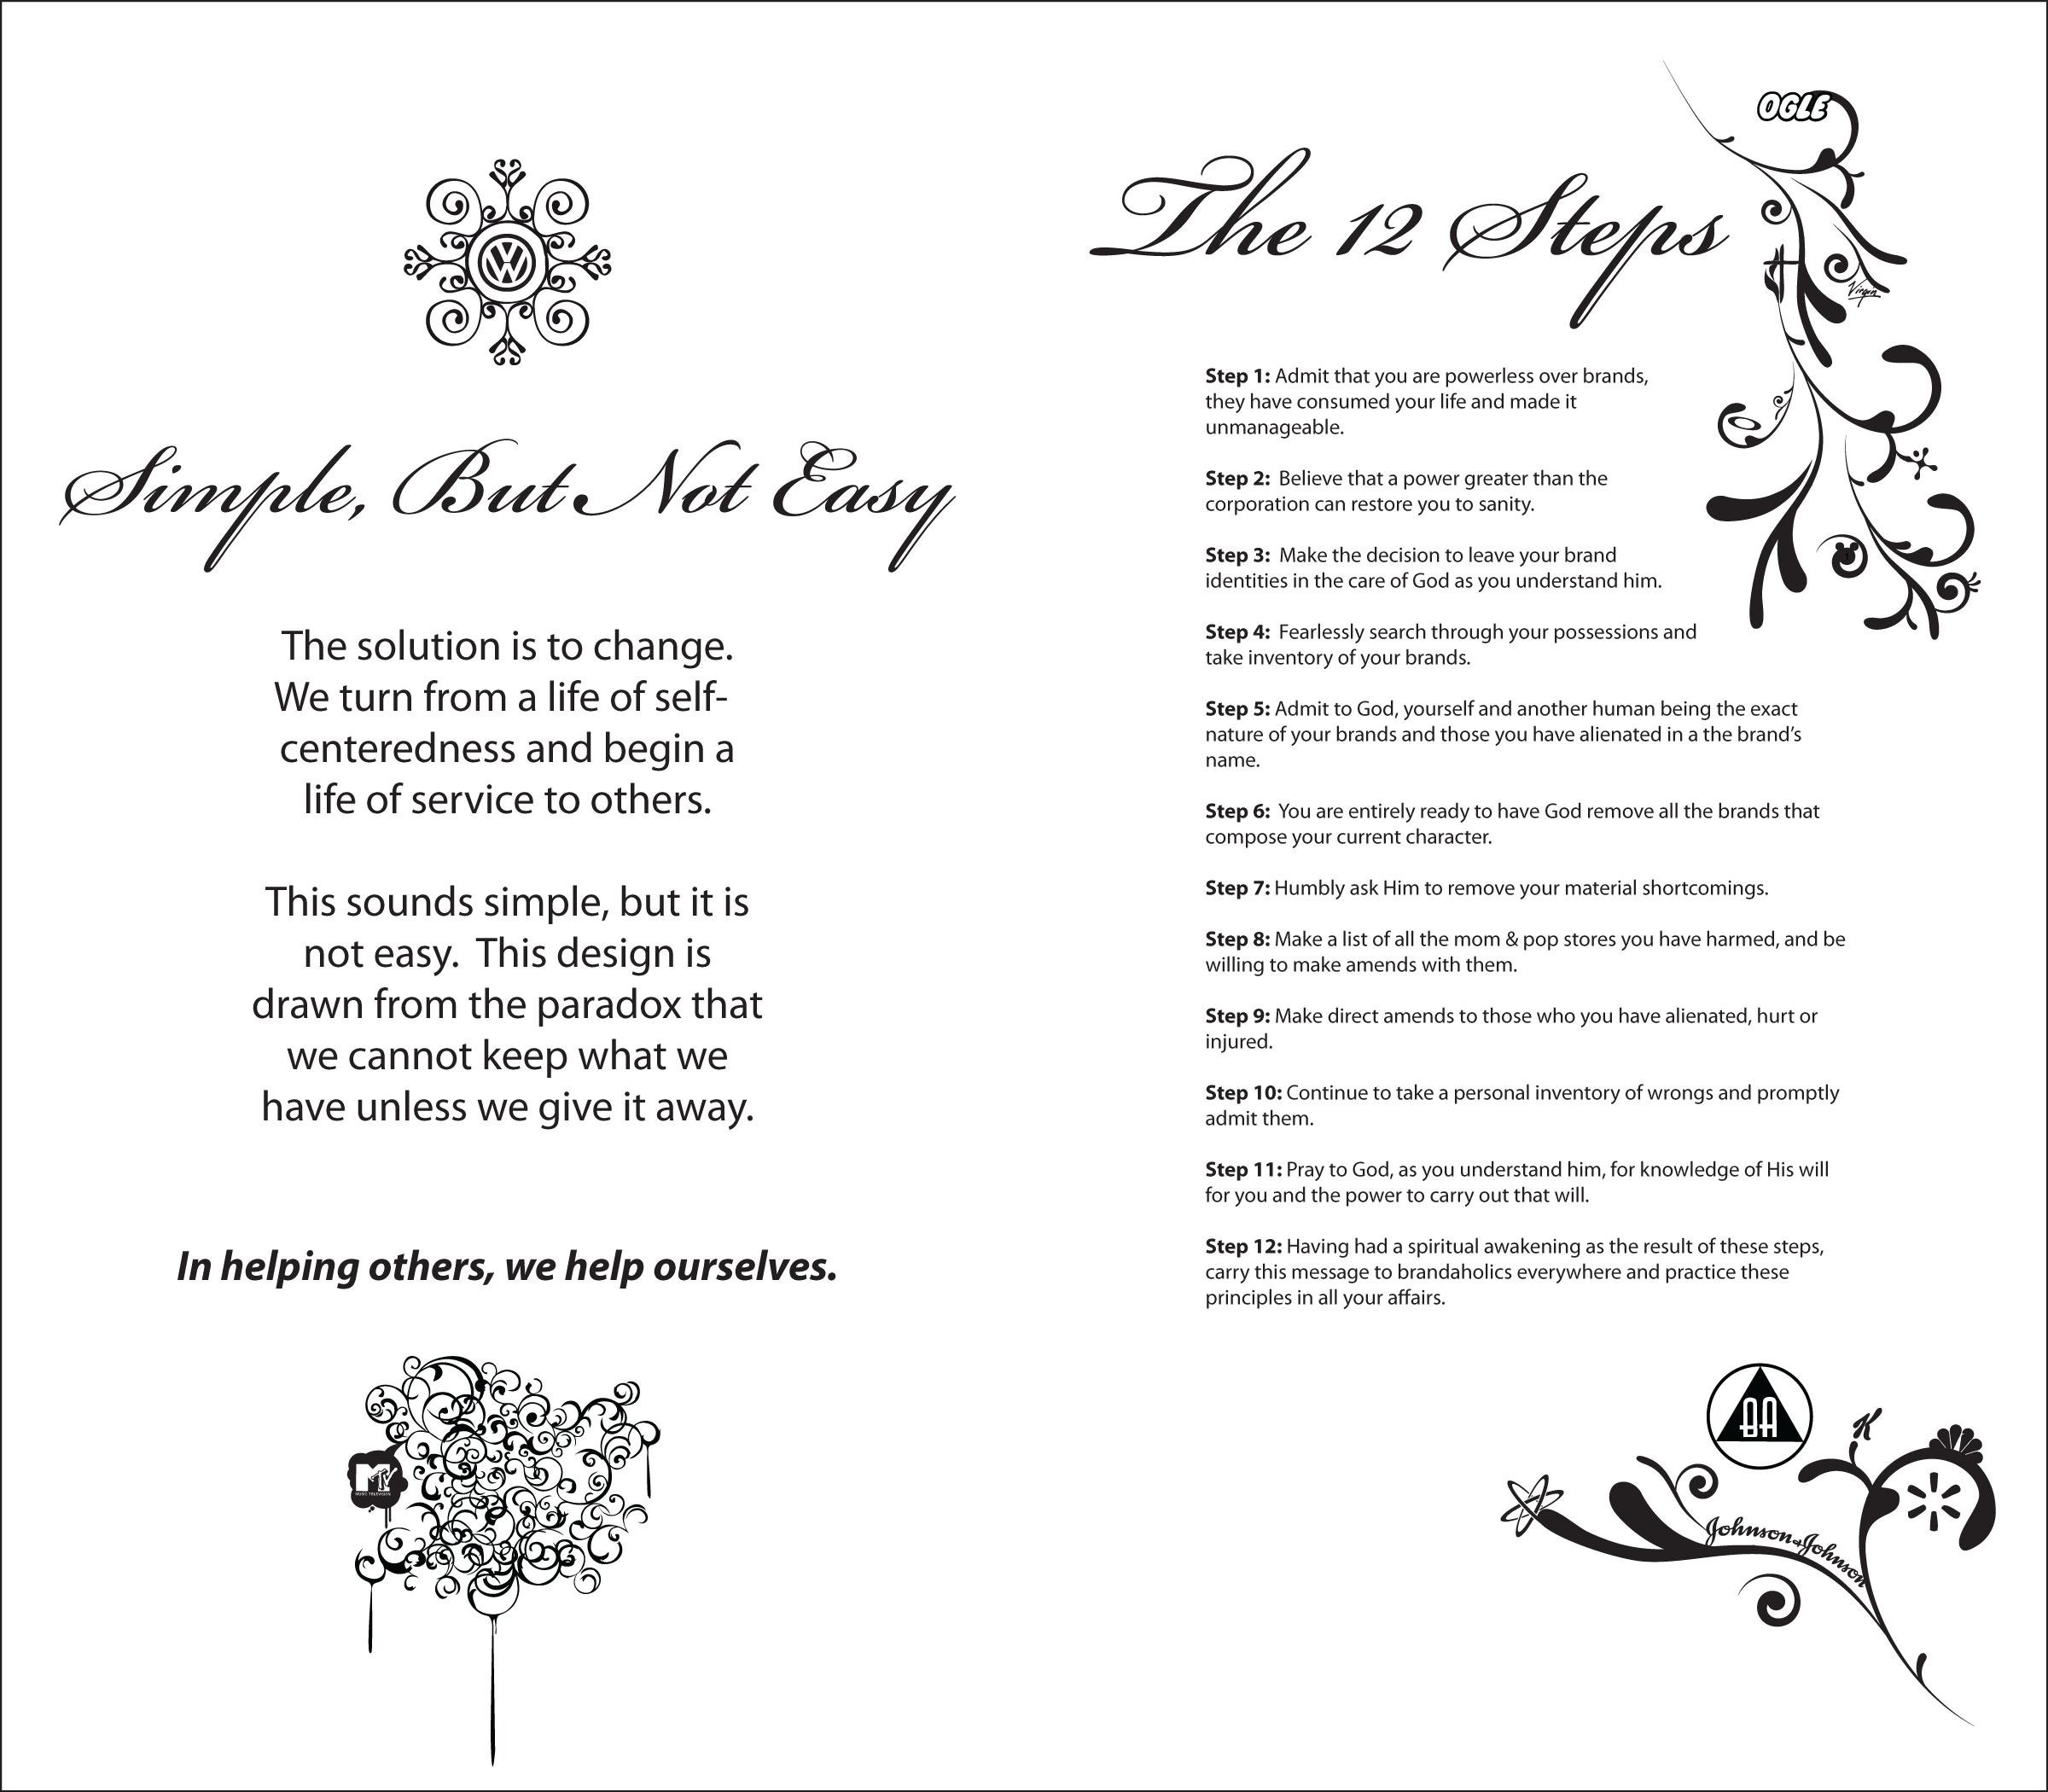 Brandaholics Page 11-12